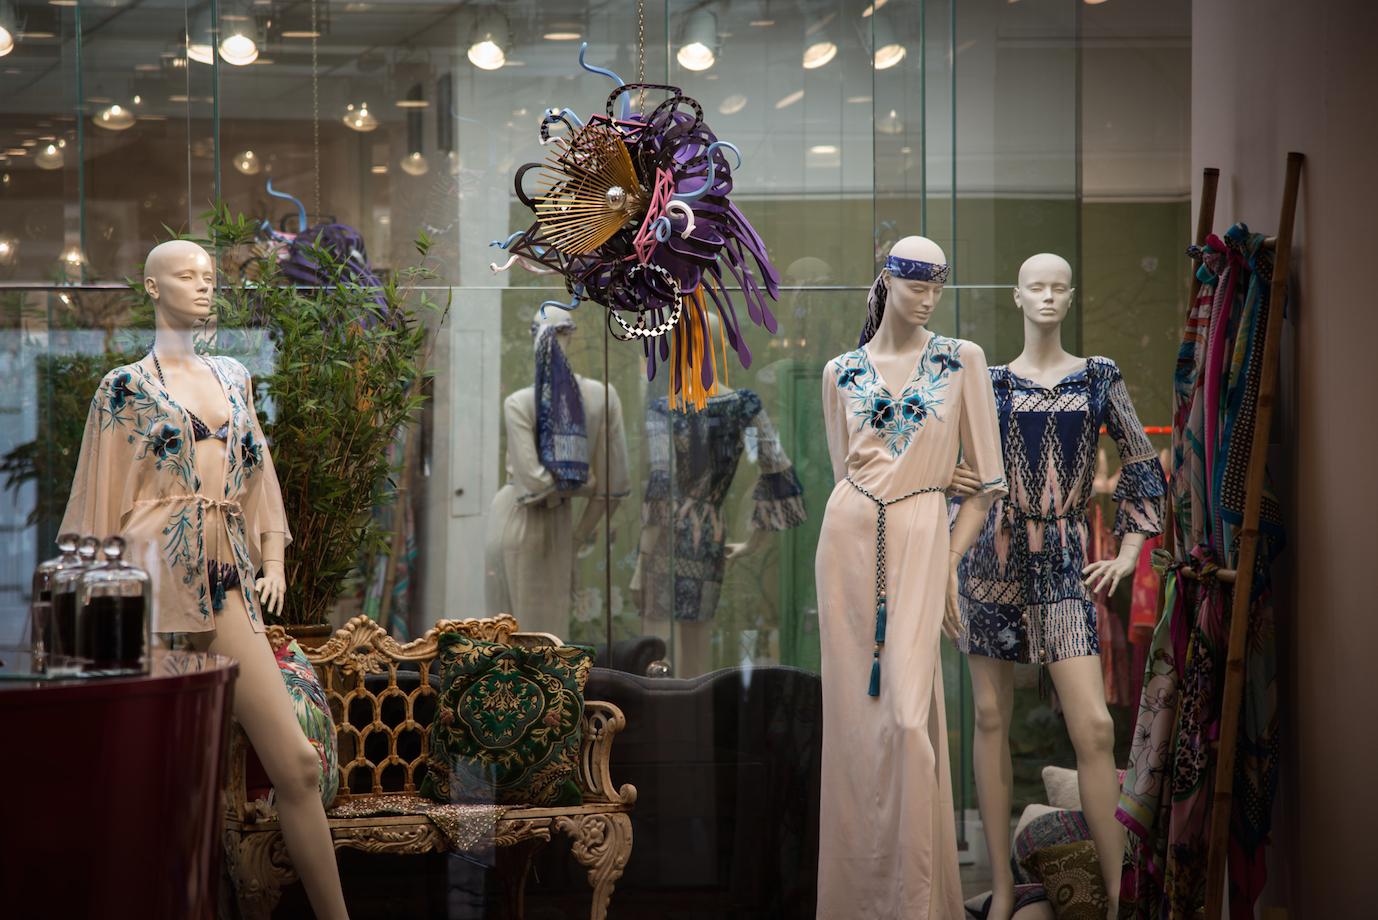 Matthew Williamson boutique, Mayfair